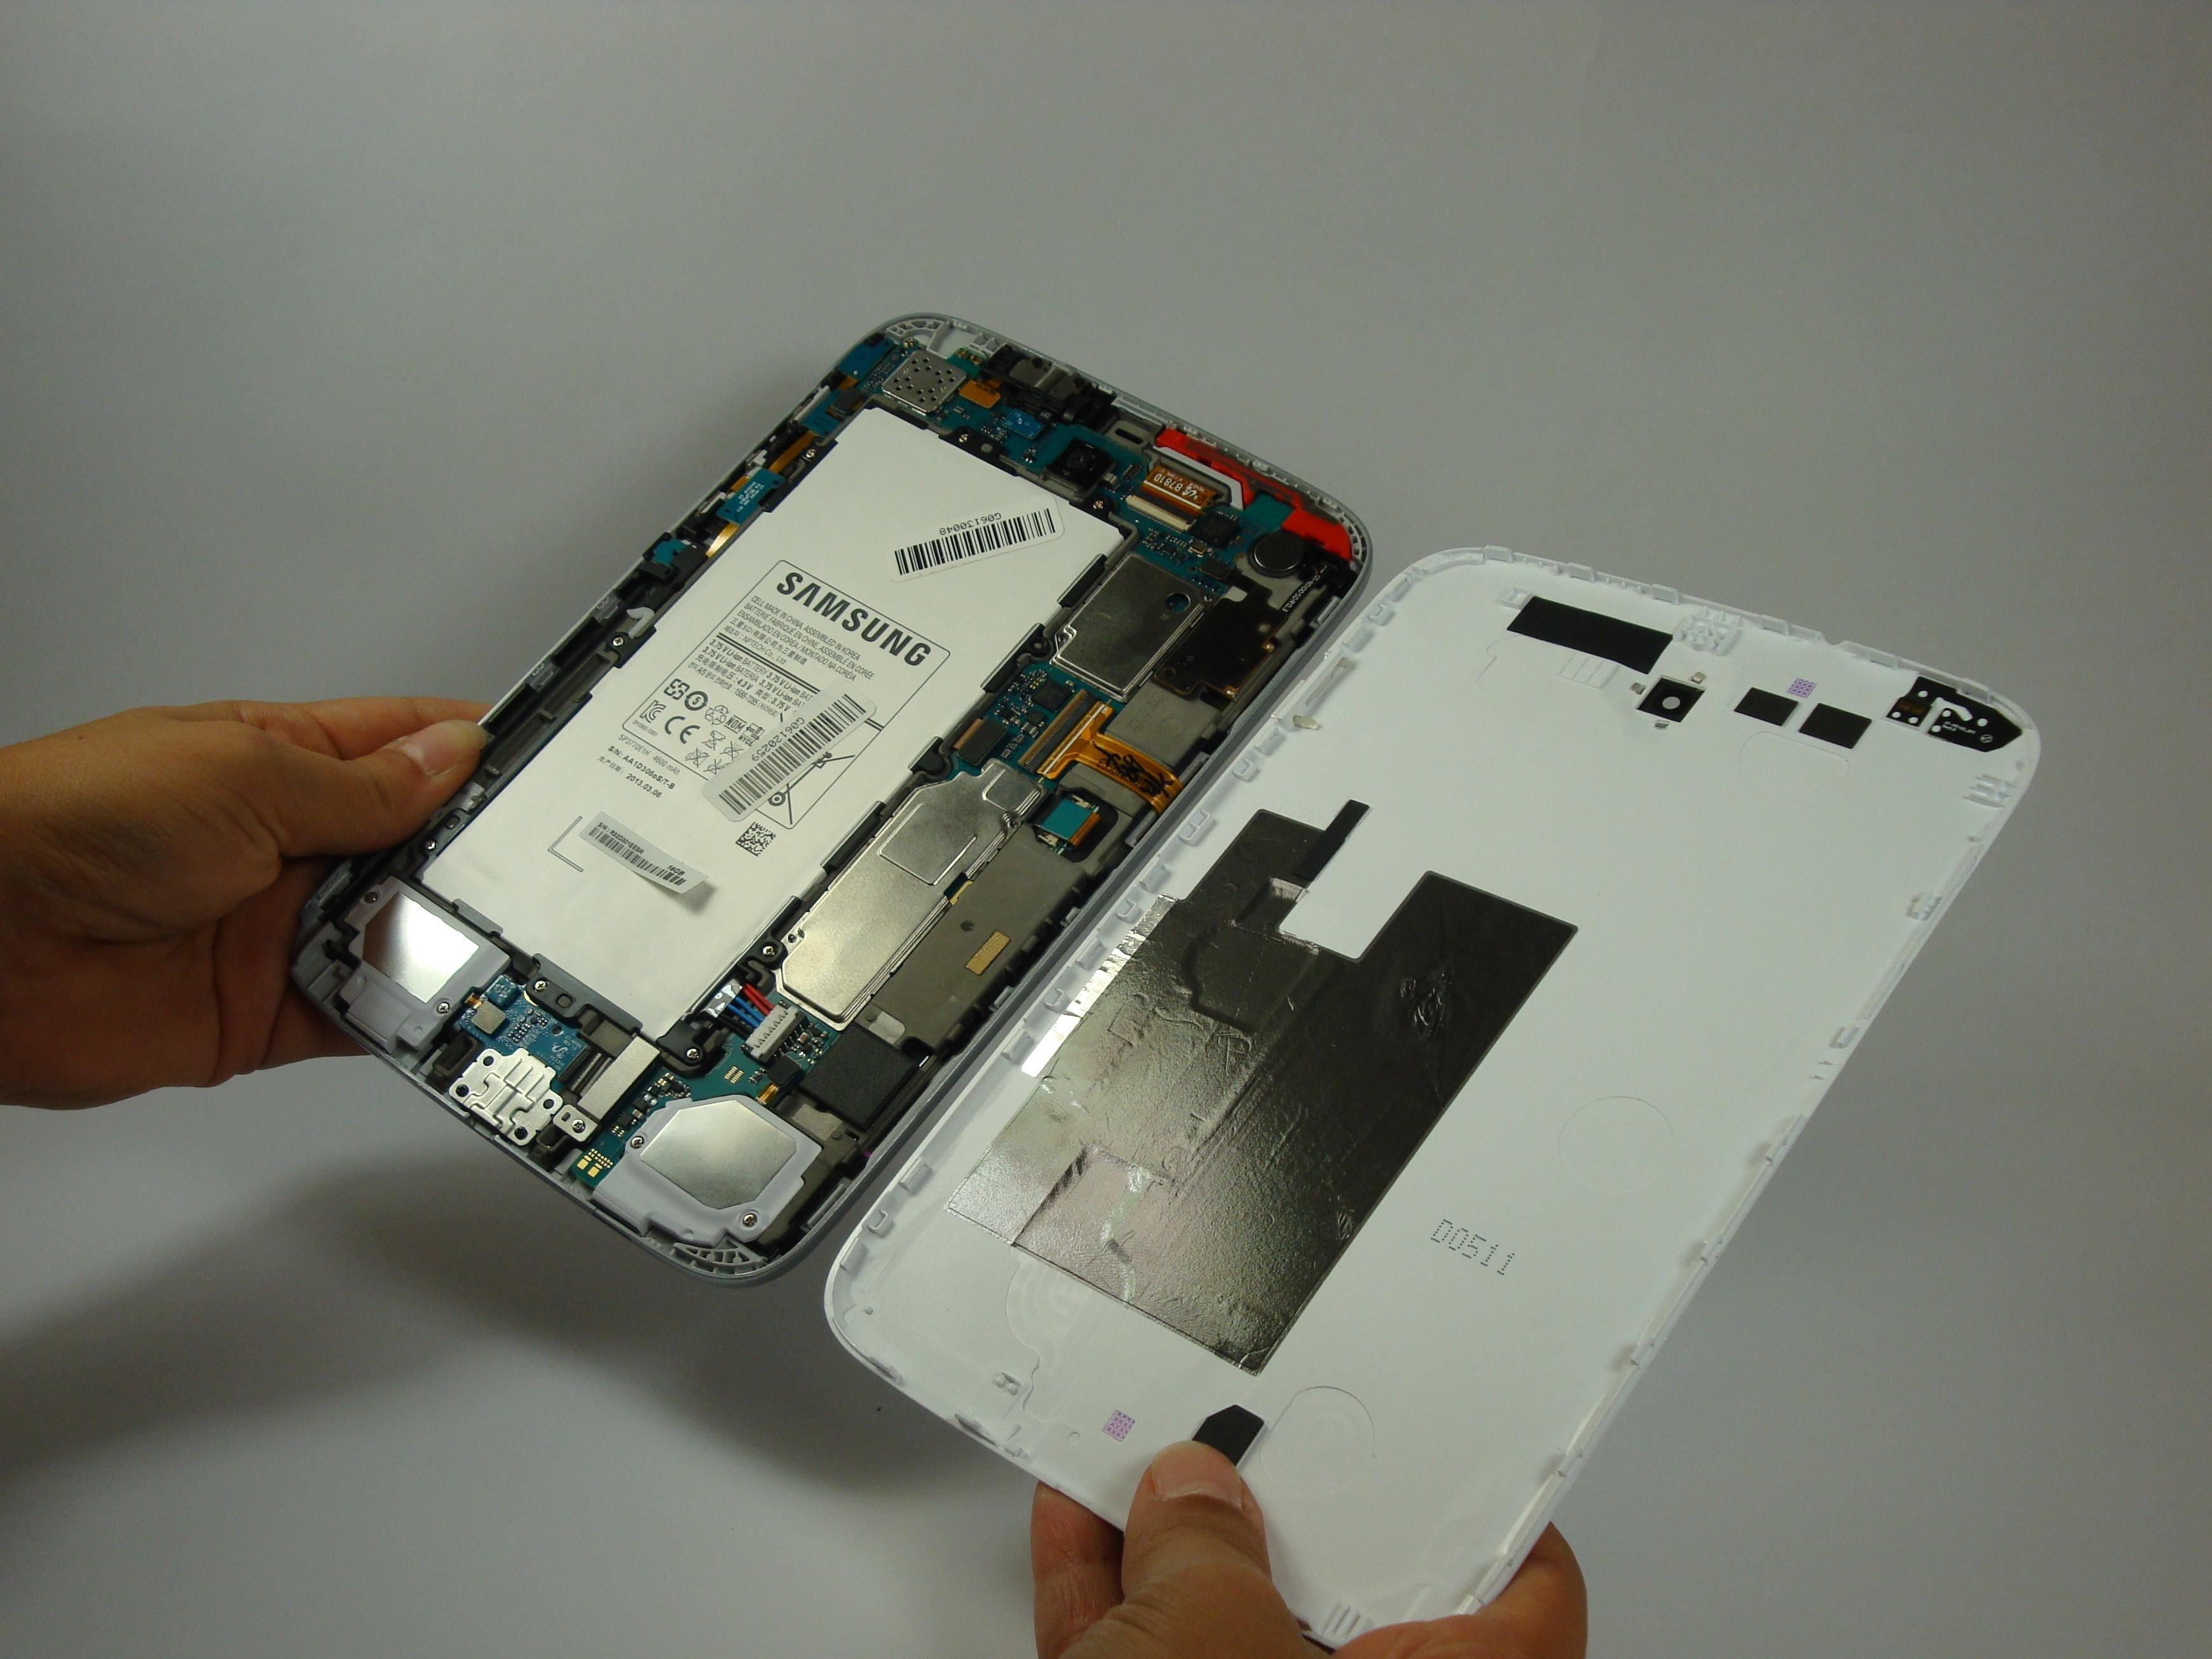 Samsung Galaxy Note 80 Tablet 2013 Repair Ifixit Usb Powered Battery Charger Circuit Gambar Skema Rangkaian Back Cover